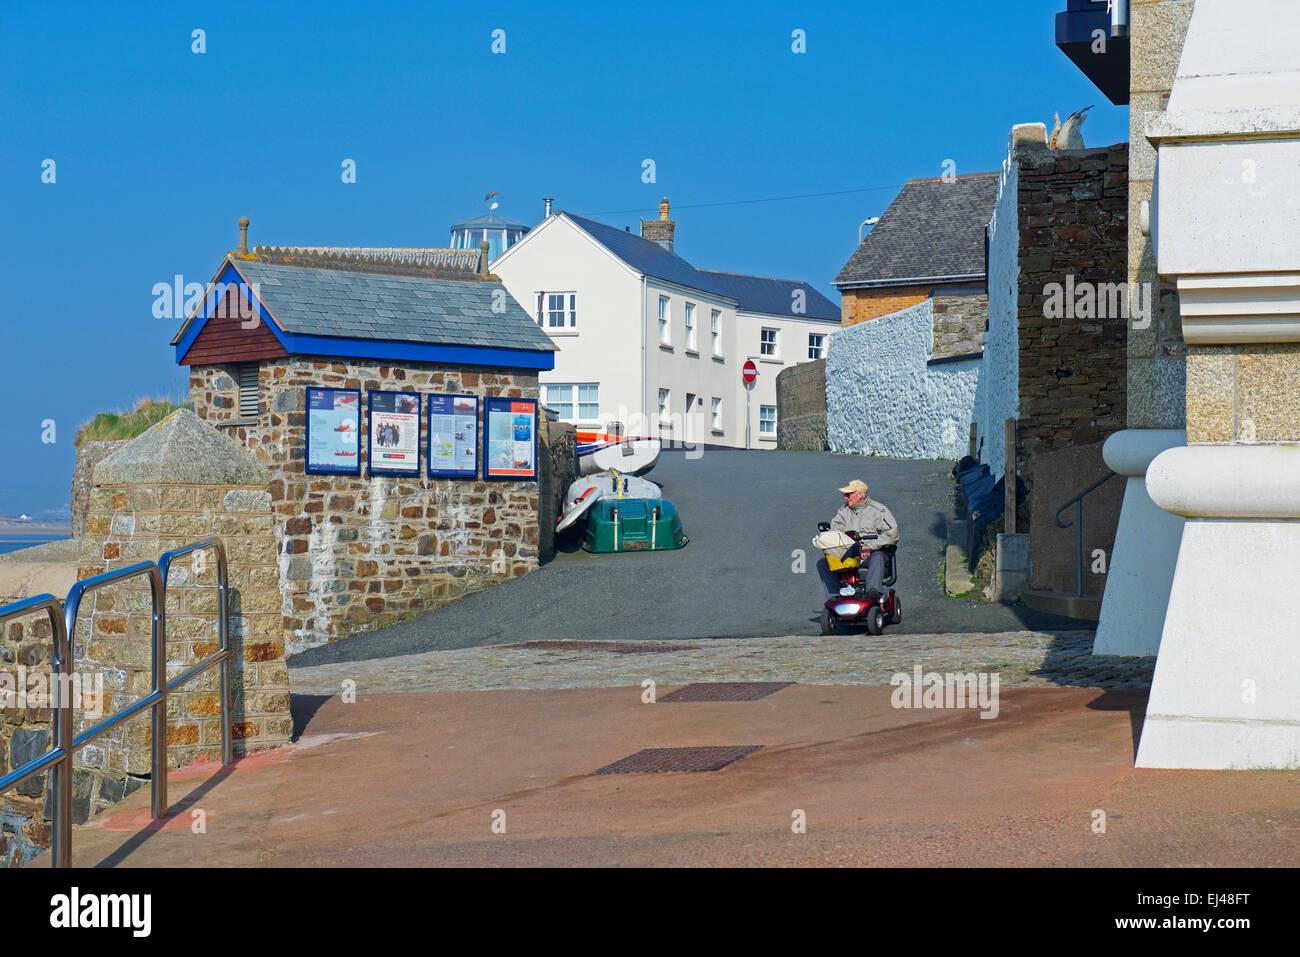 Senior man on mobility scooter, Appledore, Devon, England UK - Stock Image